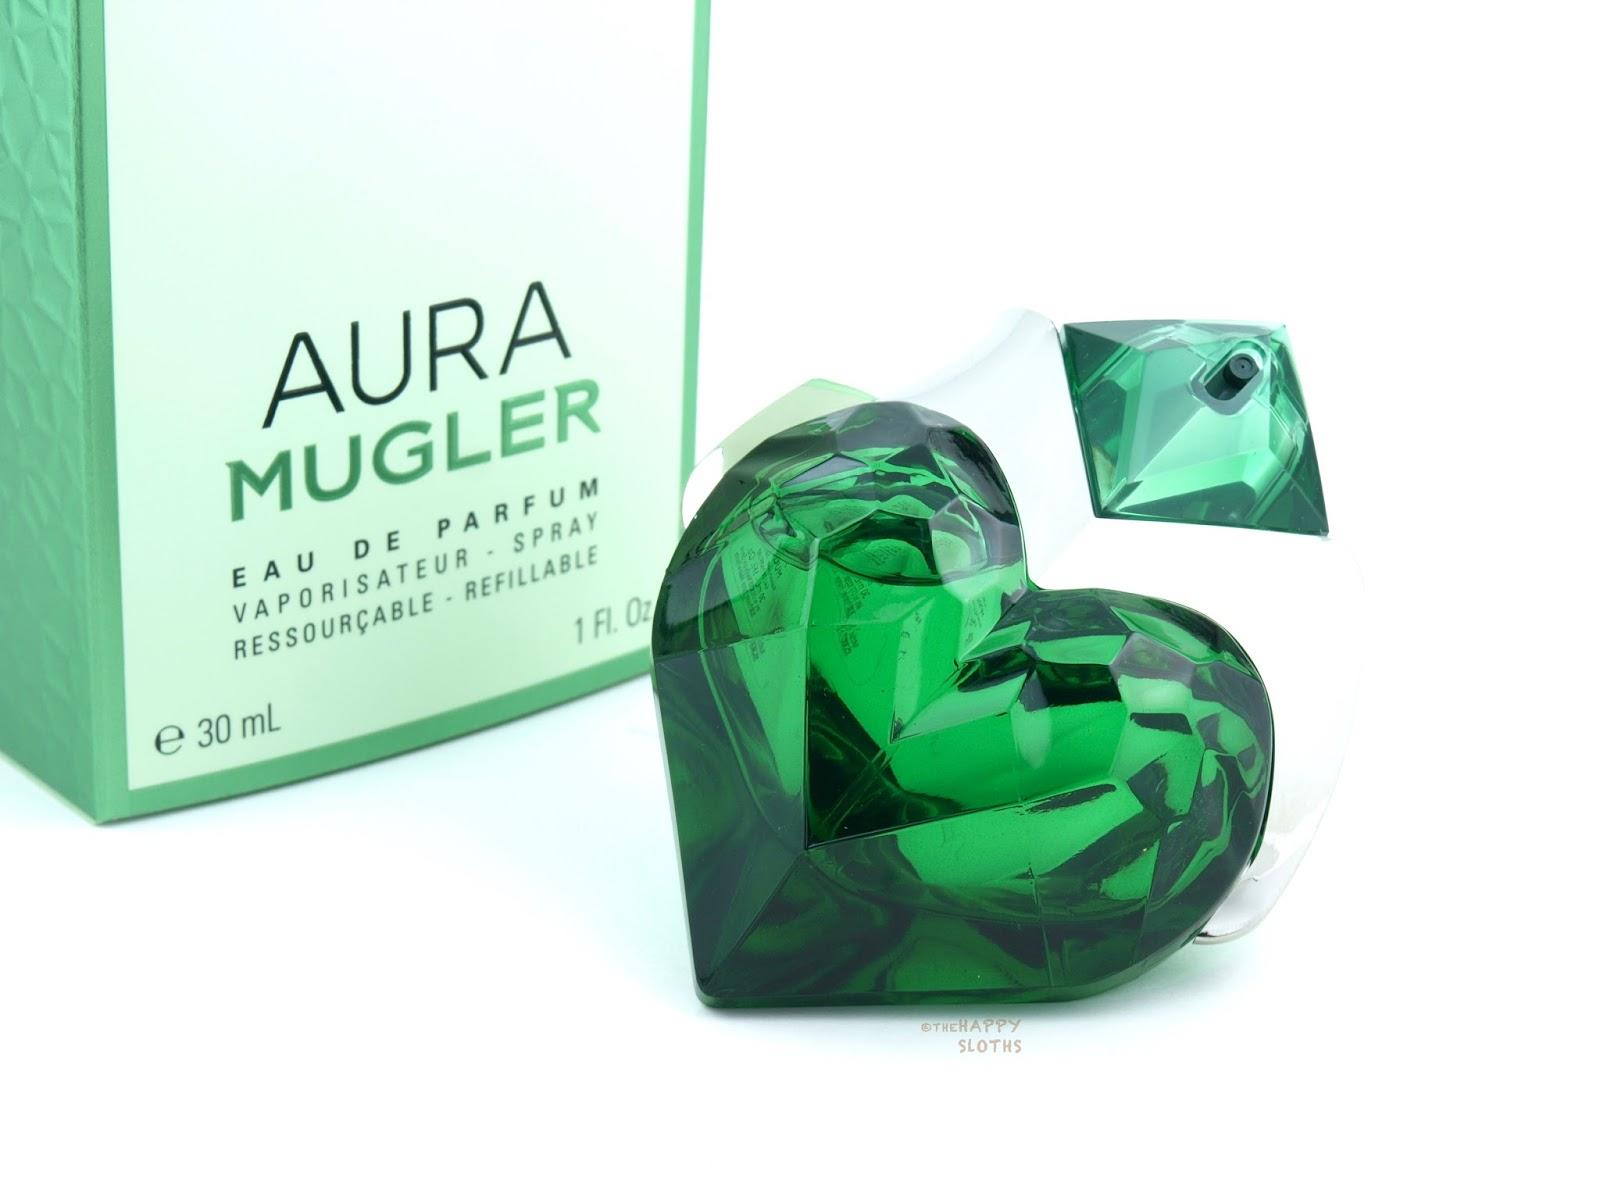 mugler aura eau de parfum review the happy sloths. Black Bedroom Furniture Sets. Home Design Ideas